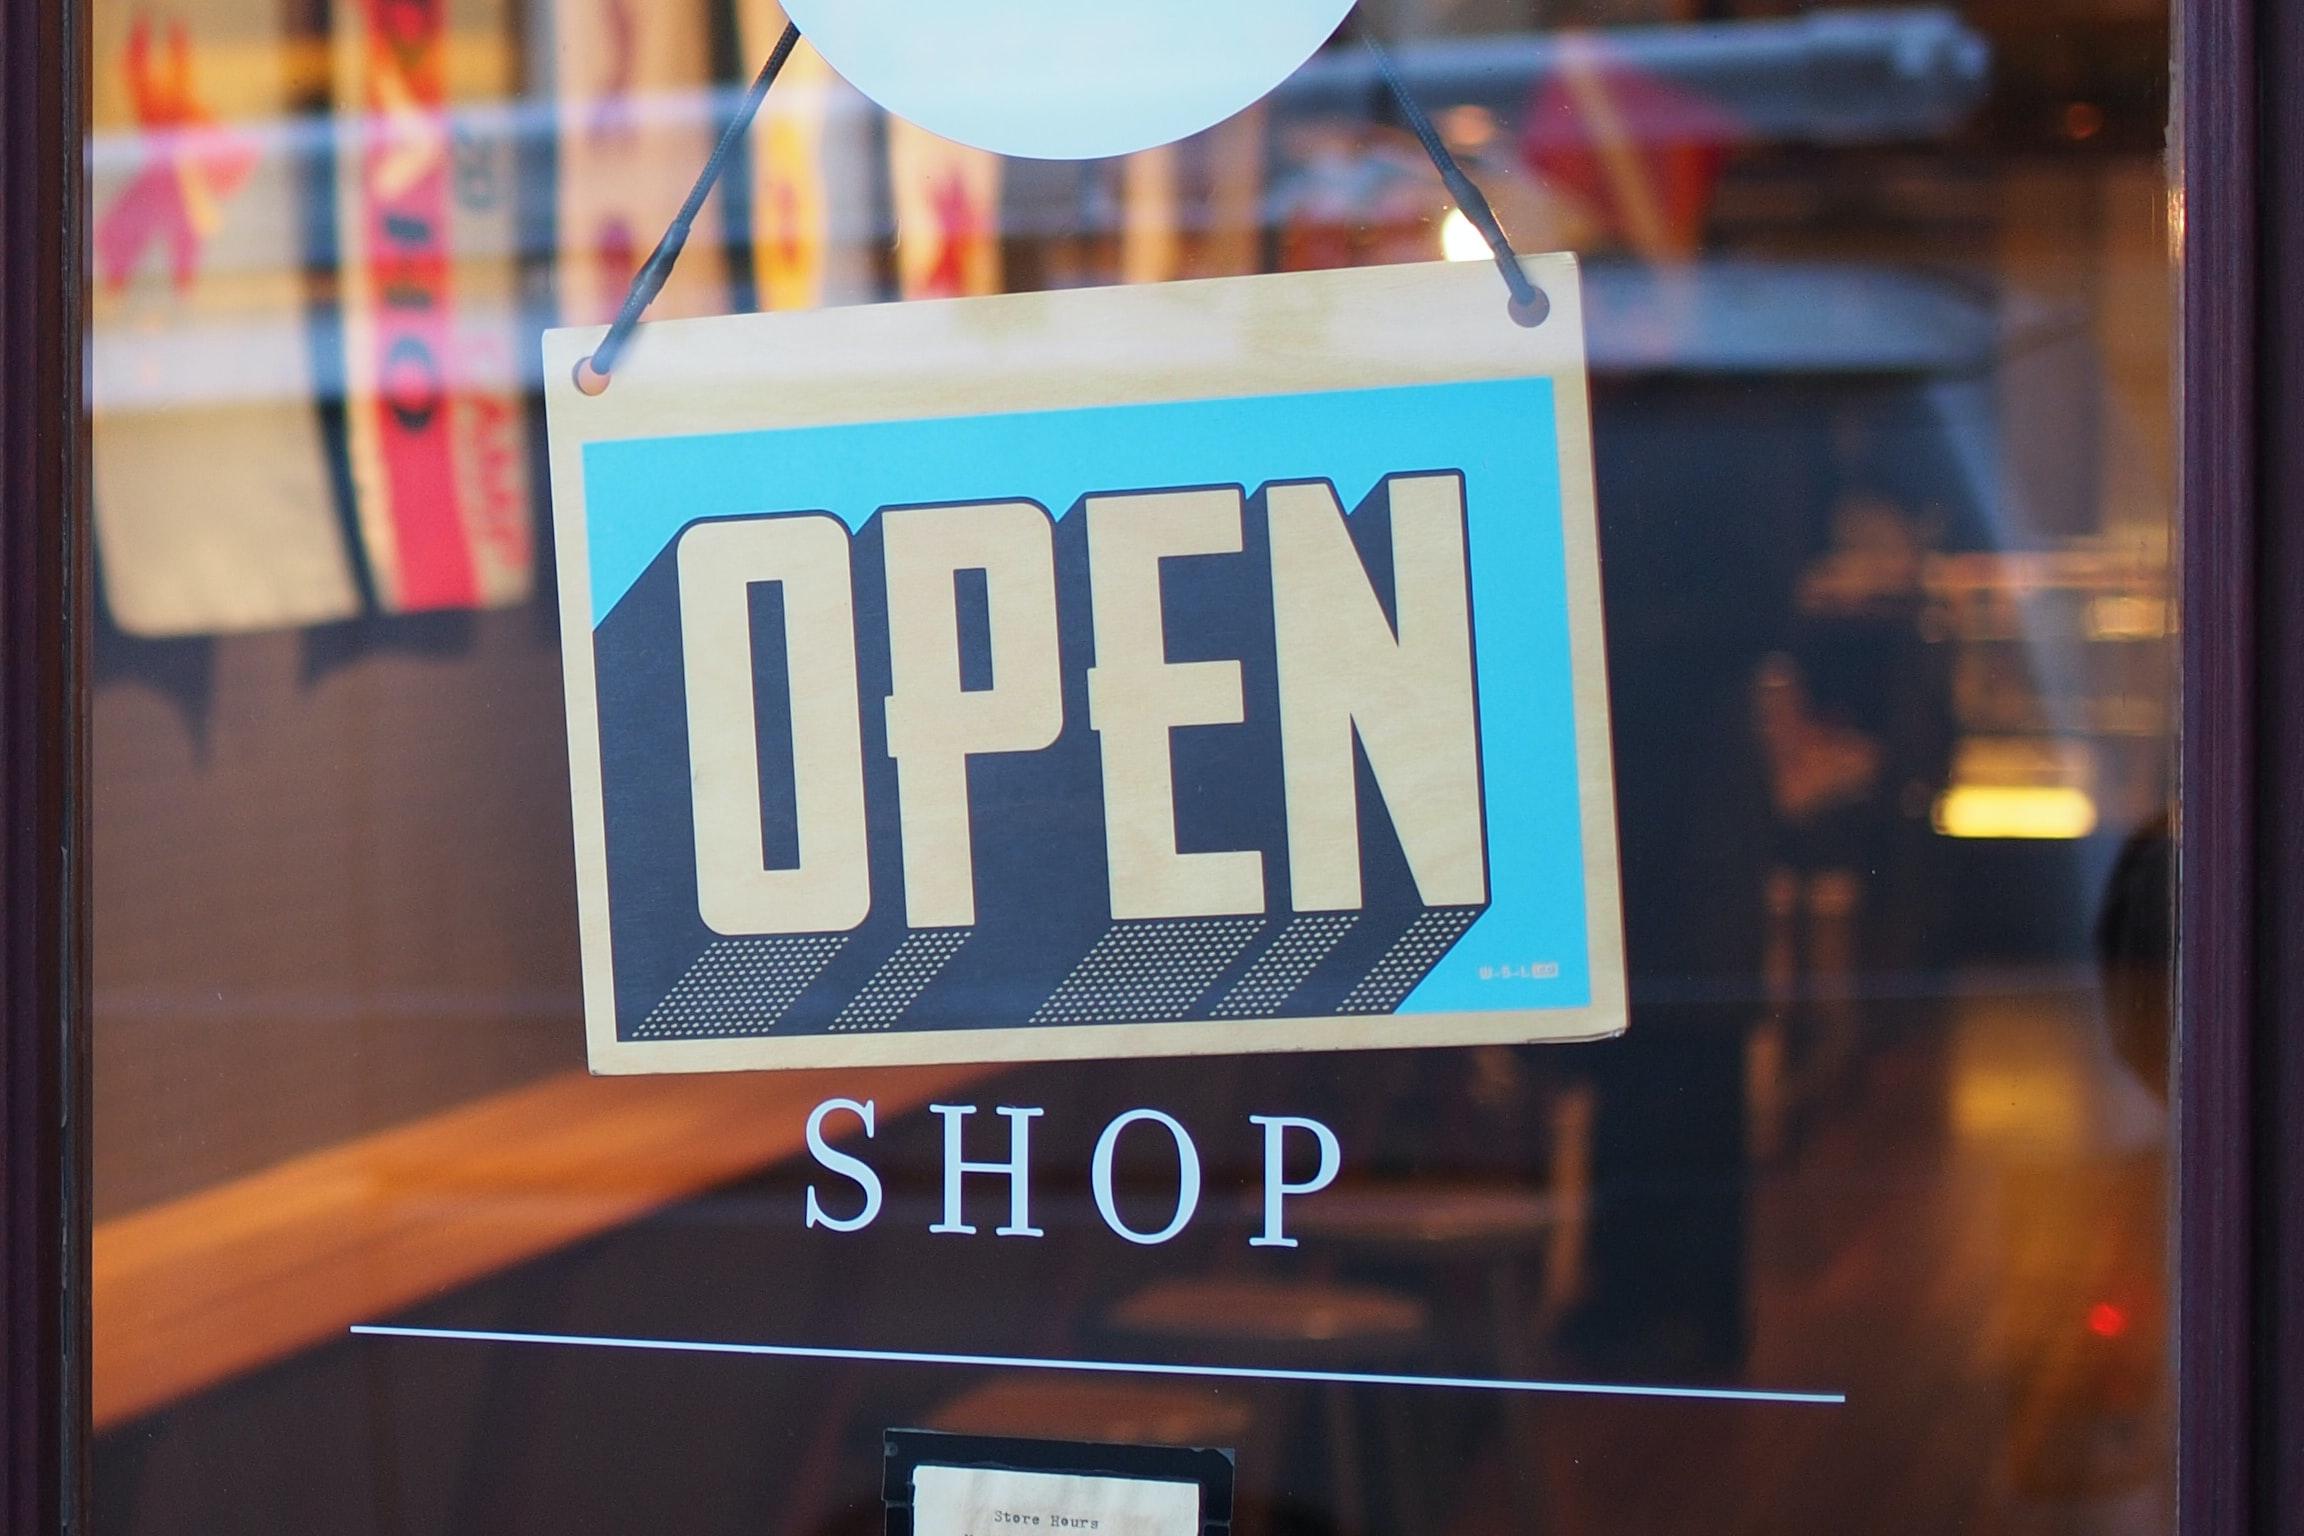 Oppizi blog: news on offline marketing, flyer distribution and advertising